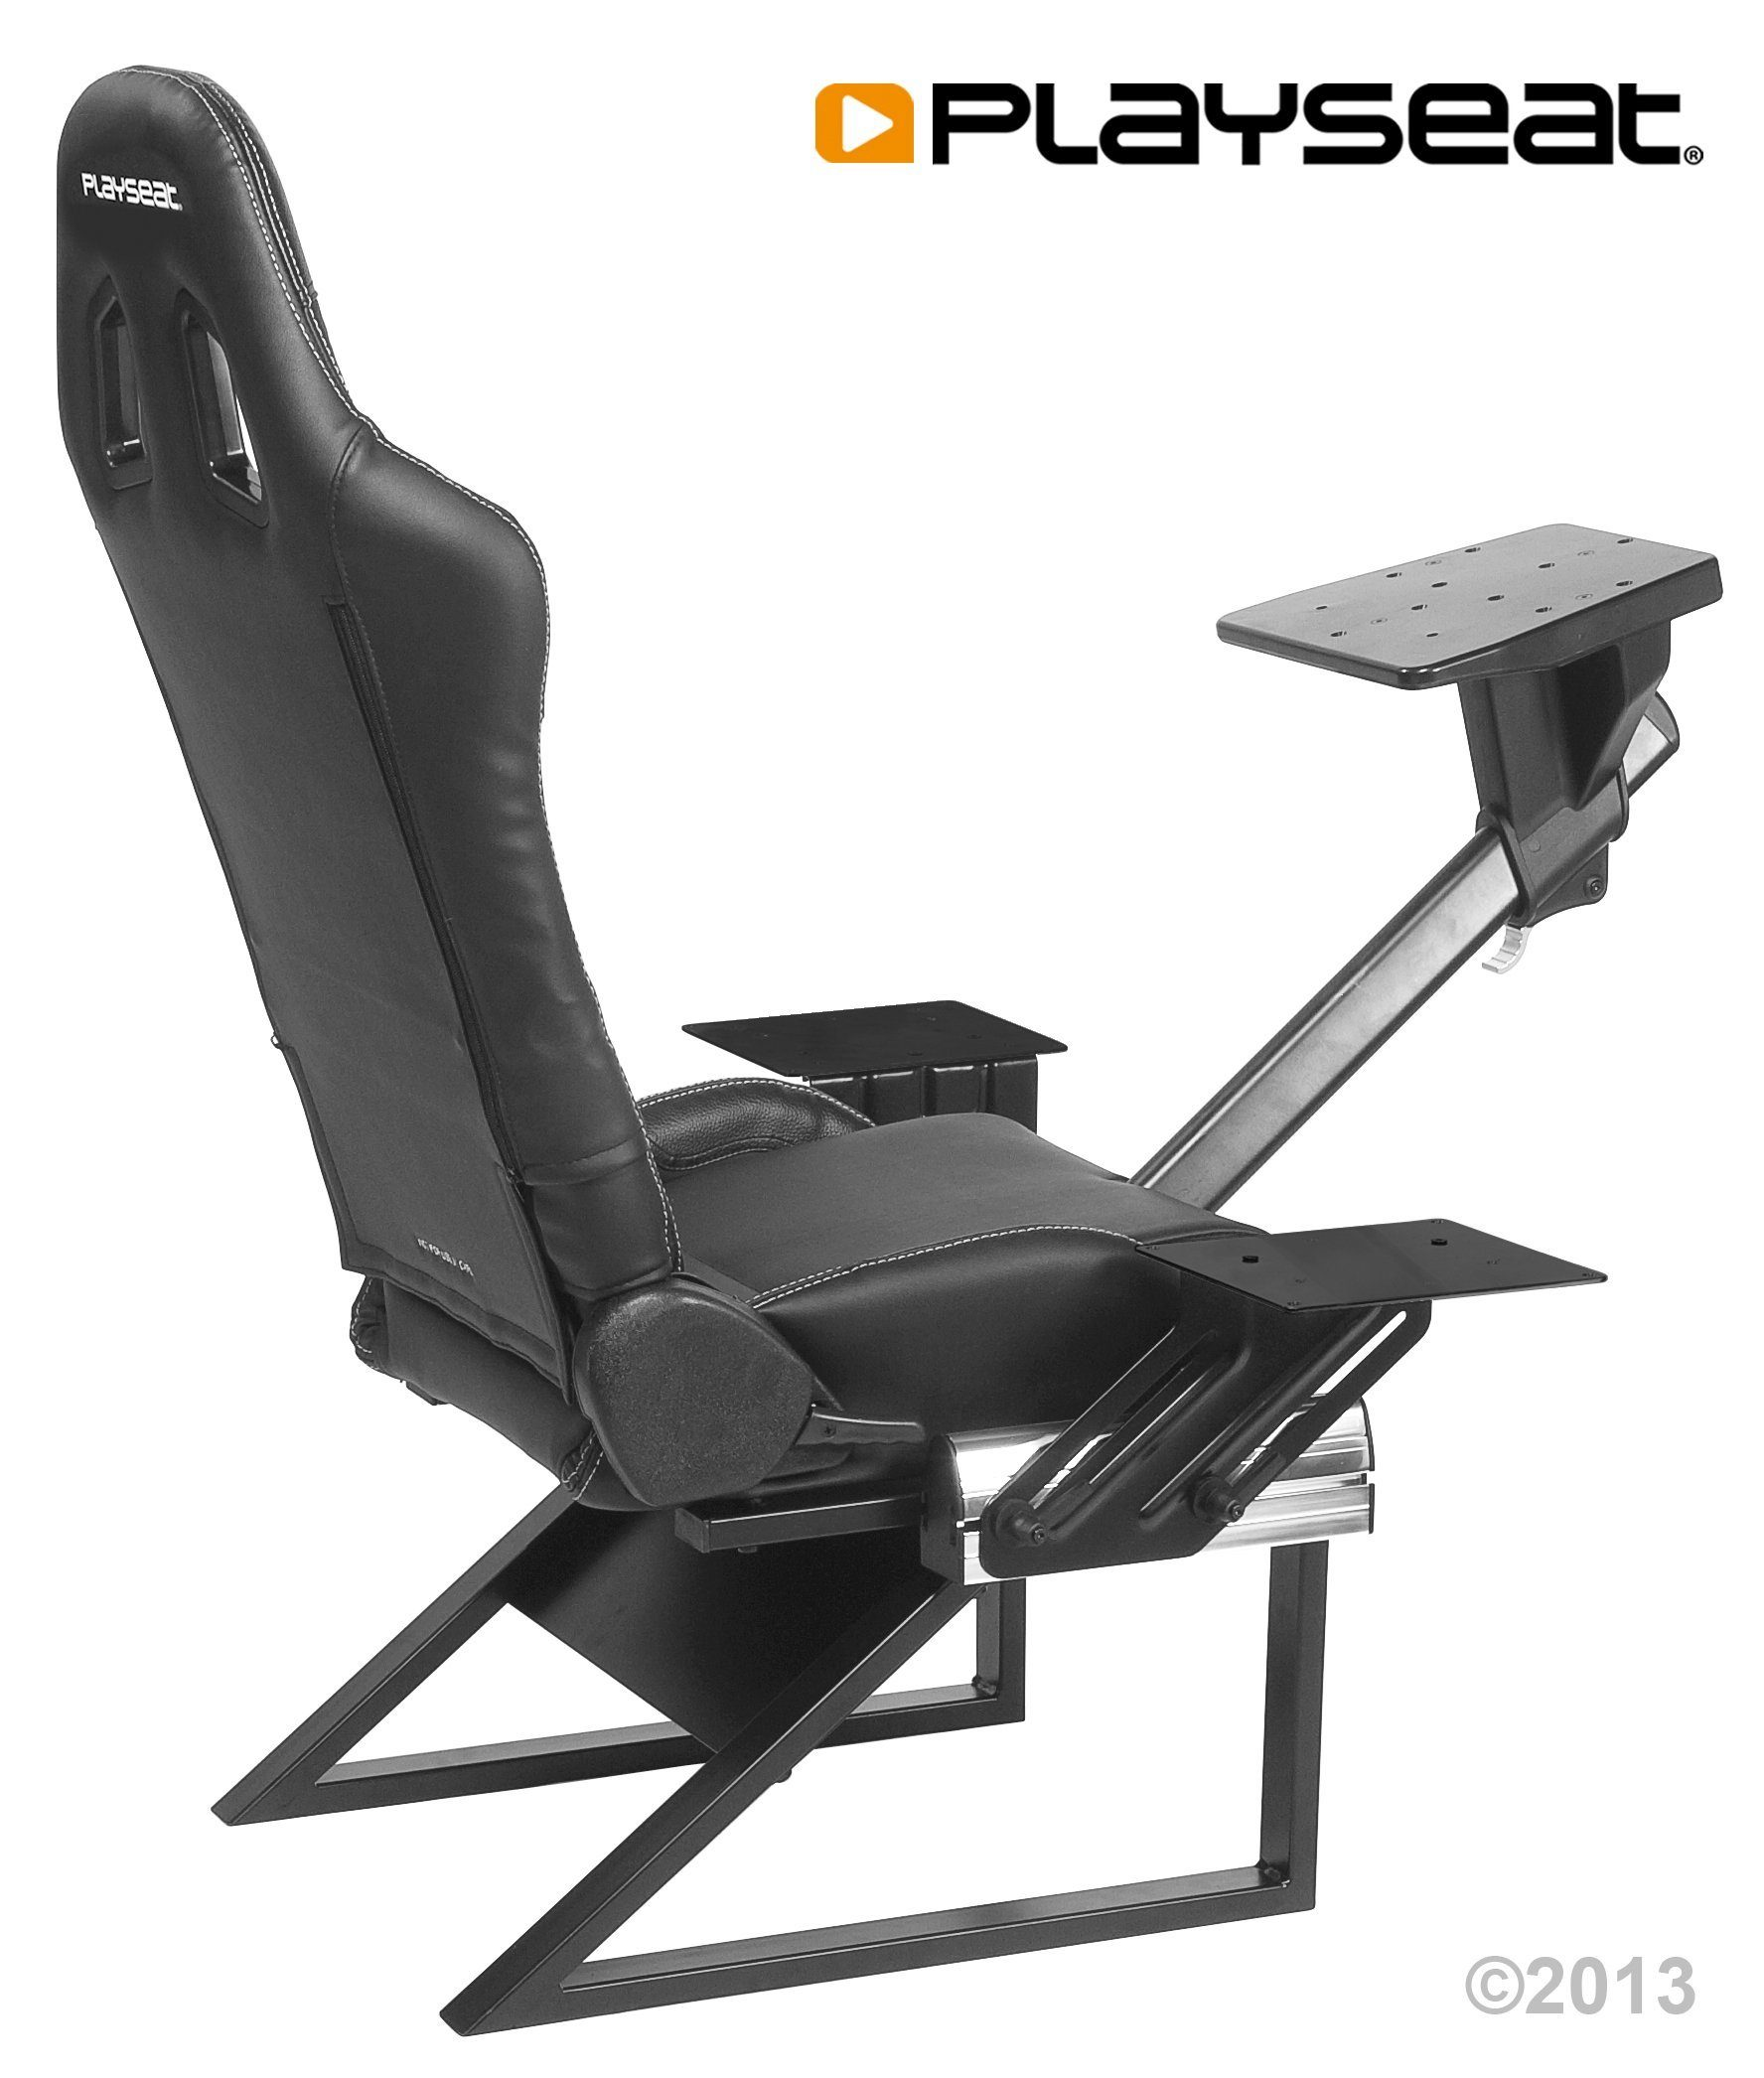 Playseats Sitz für Flugsimulator Playseat Air Force »PS3 PS4 PC X360 XBox One«